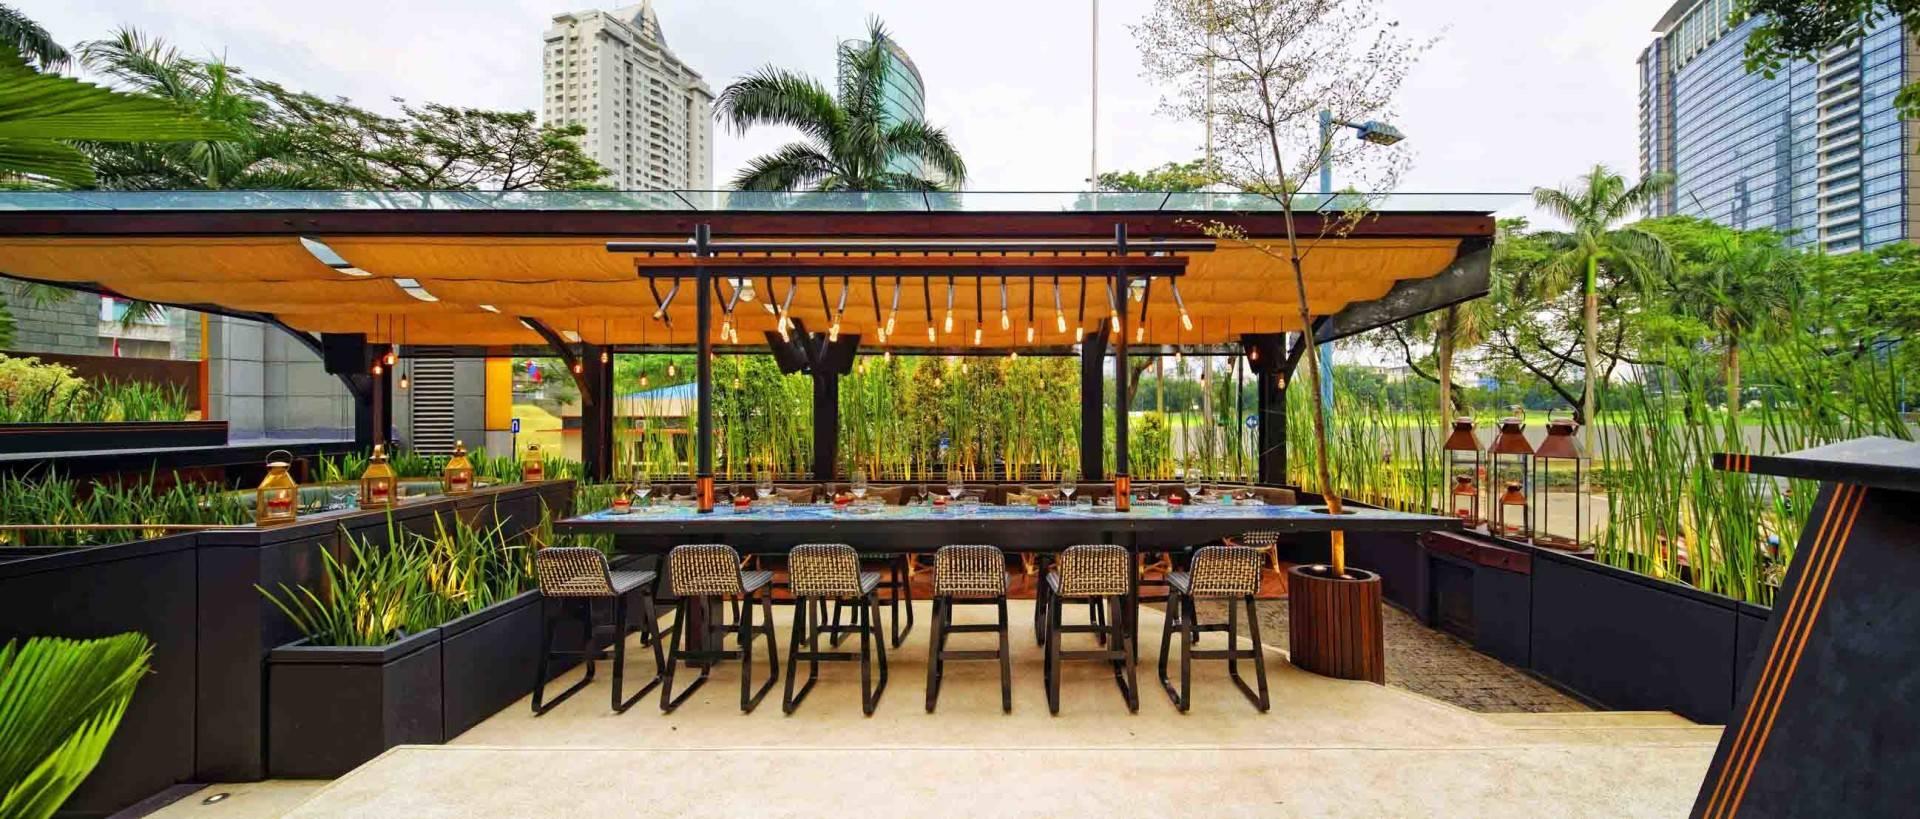 Leo Einstein Fransiscus Bottega Ristorante Mega Kuningan Mega Kuningan Seating Area Restaurant   7832